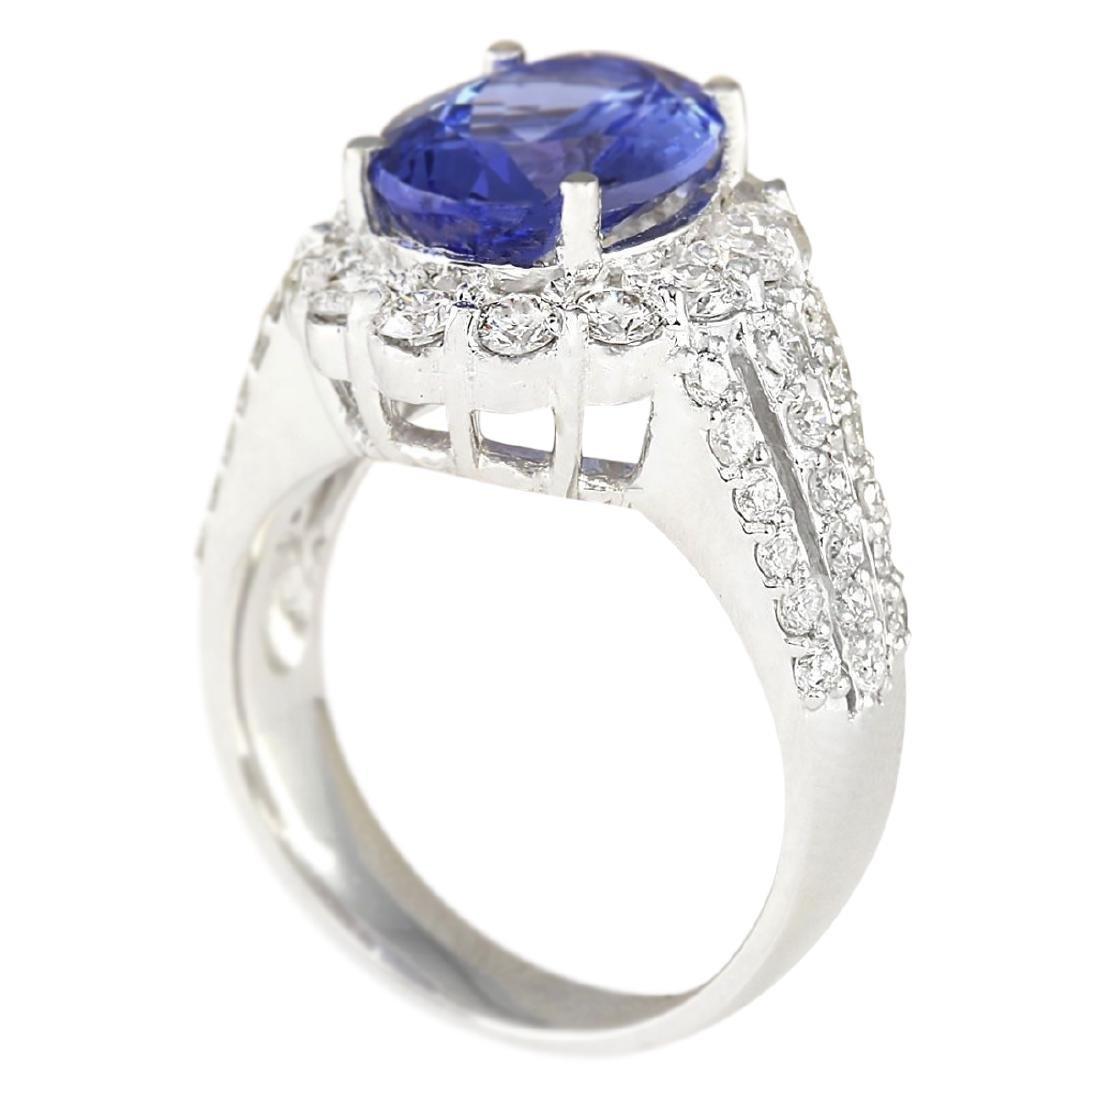 5.42 CTW Natural Blue Tanzanite And Diamond Ring 18K - 3